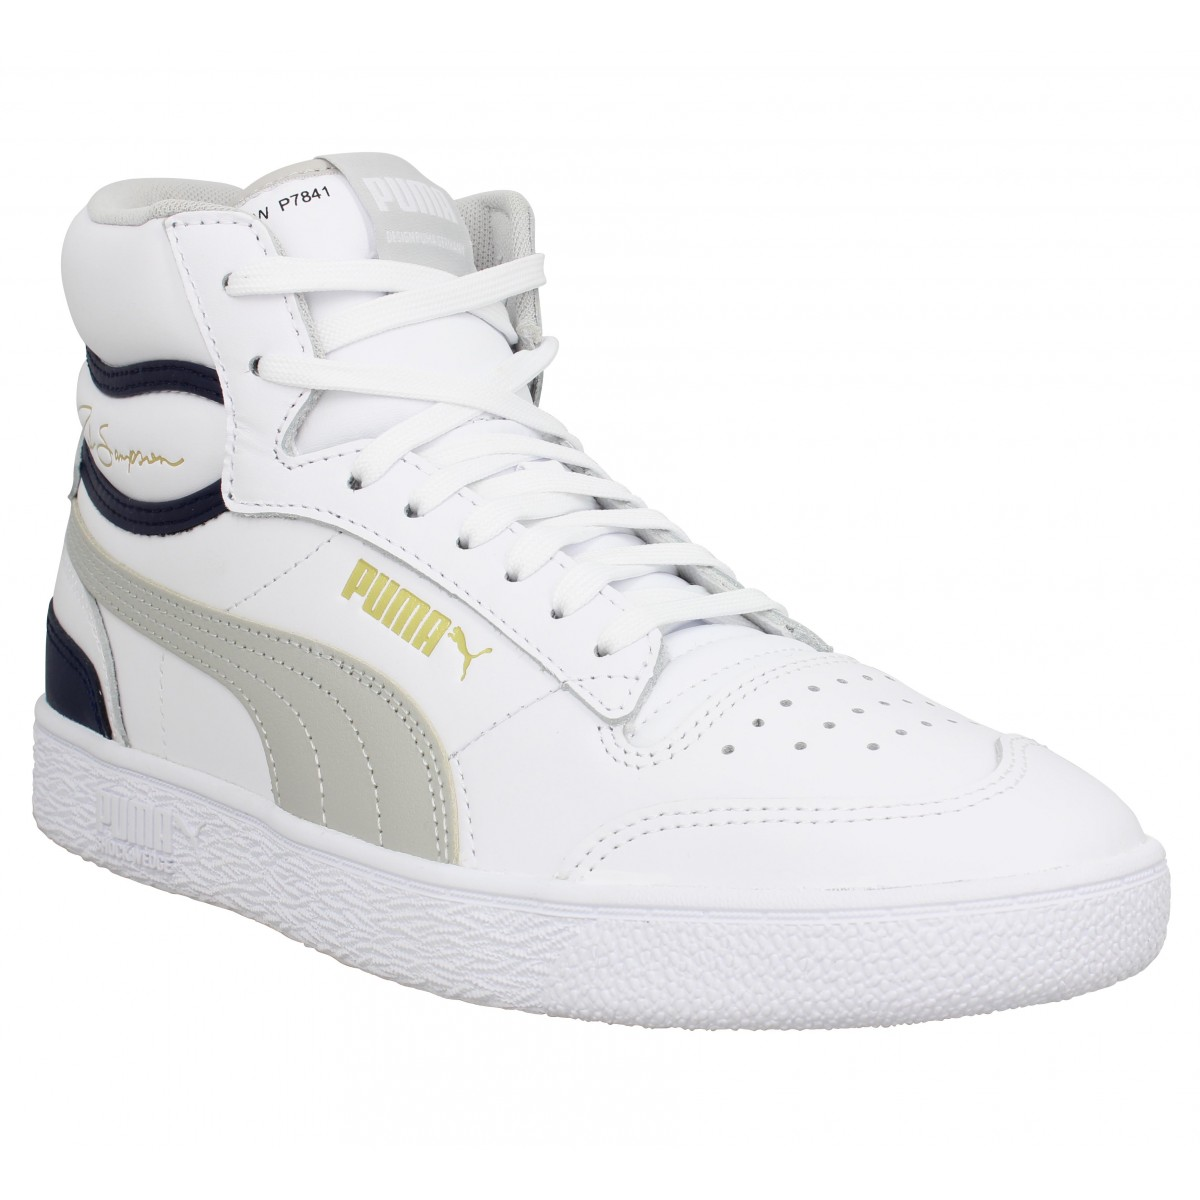 puma chaussures hommes blanche